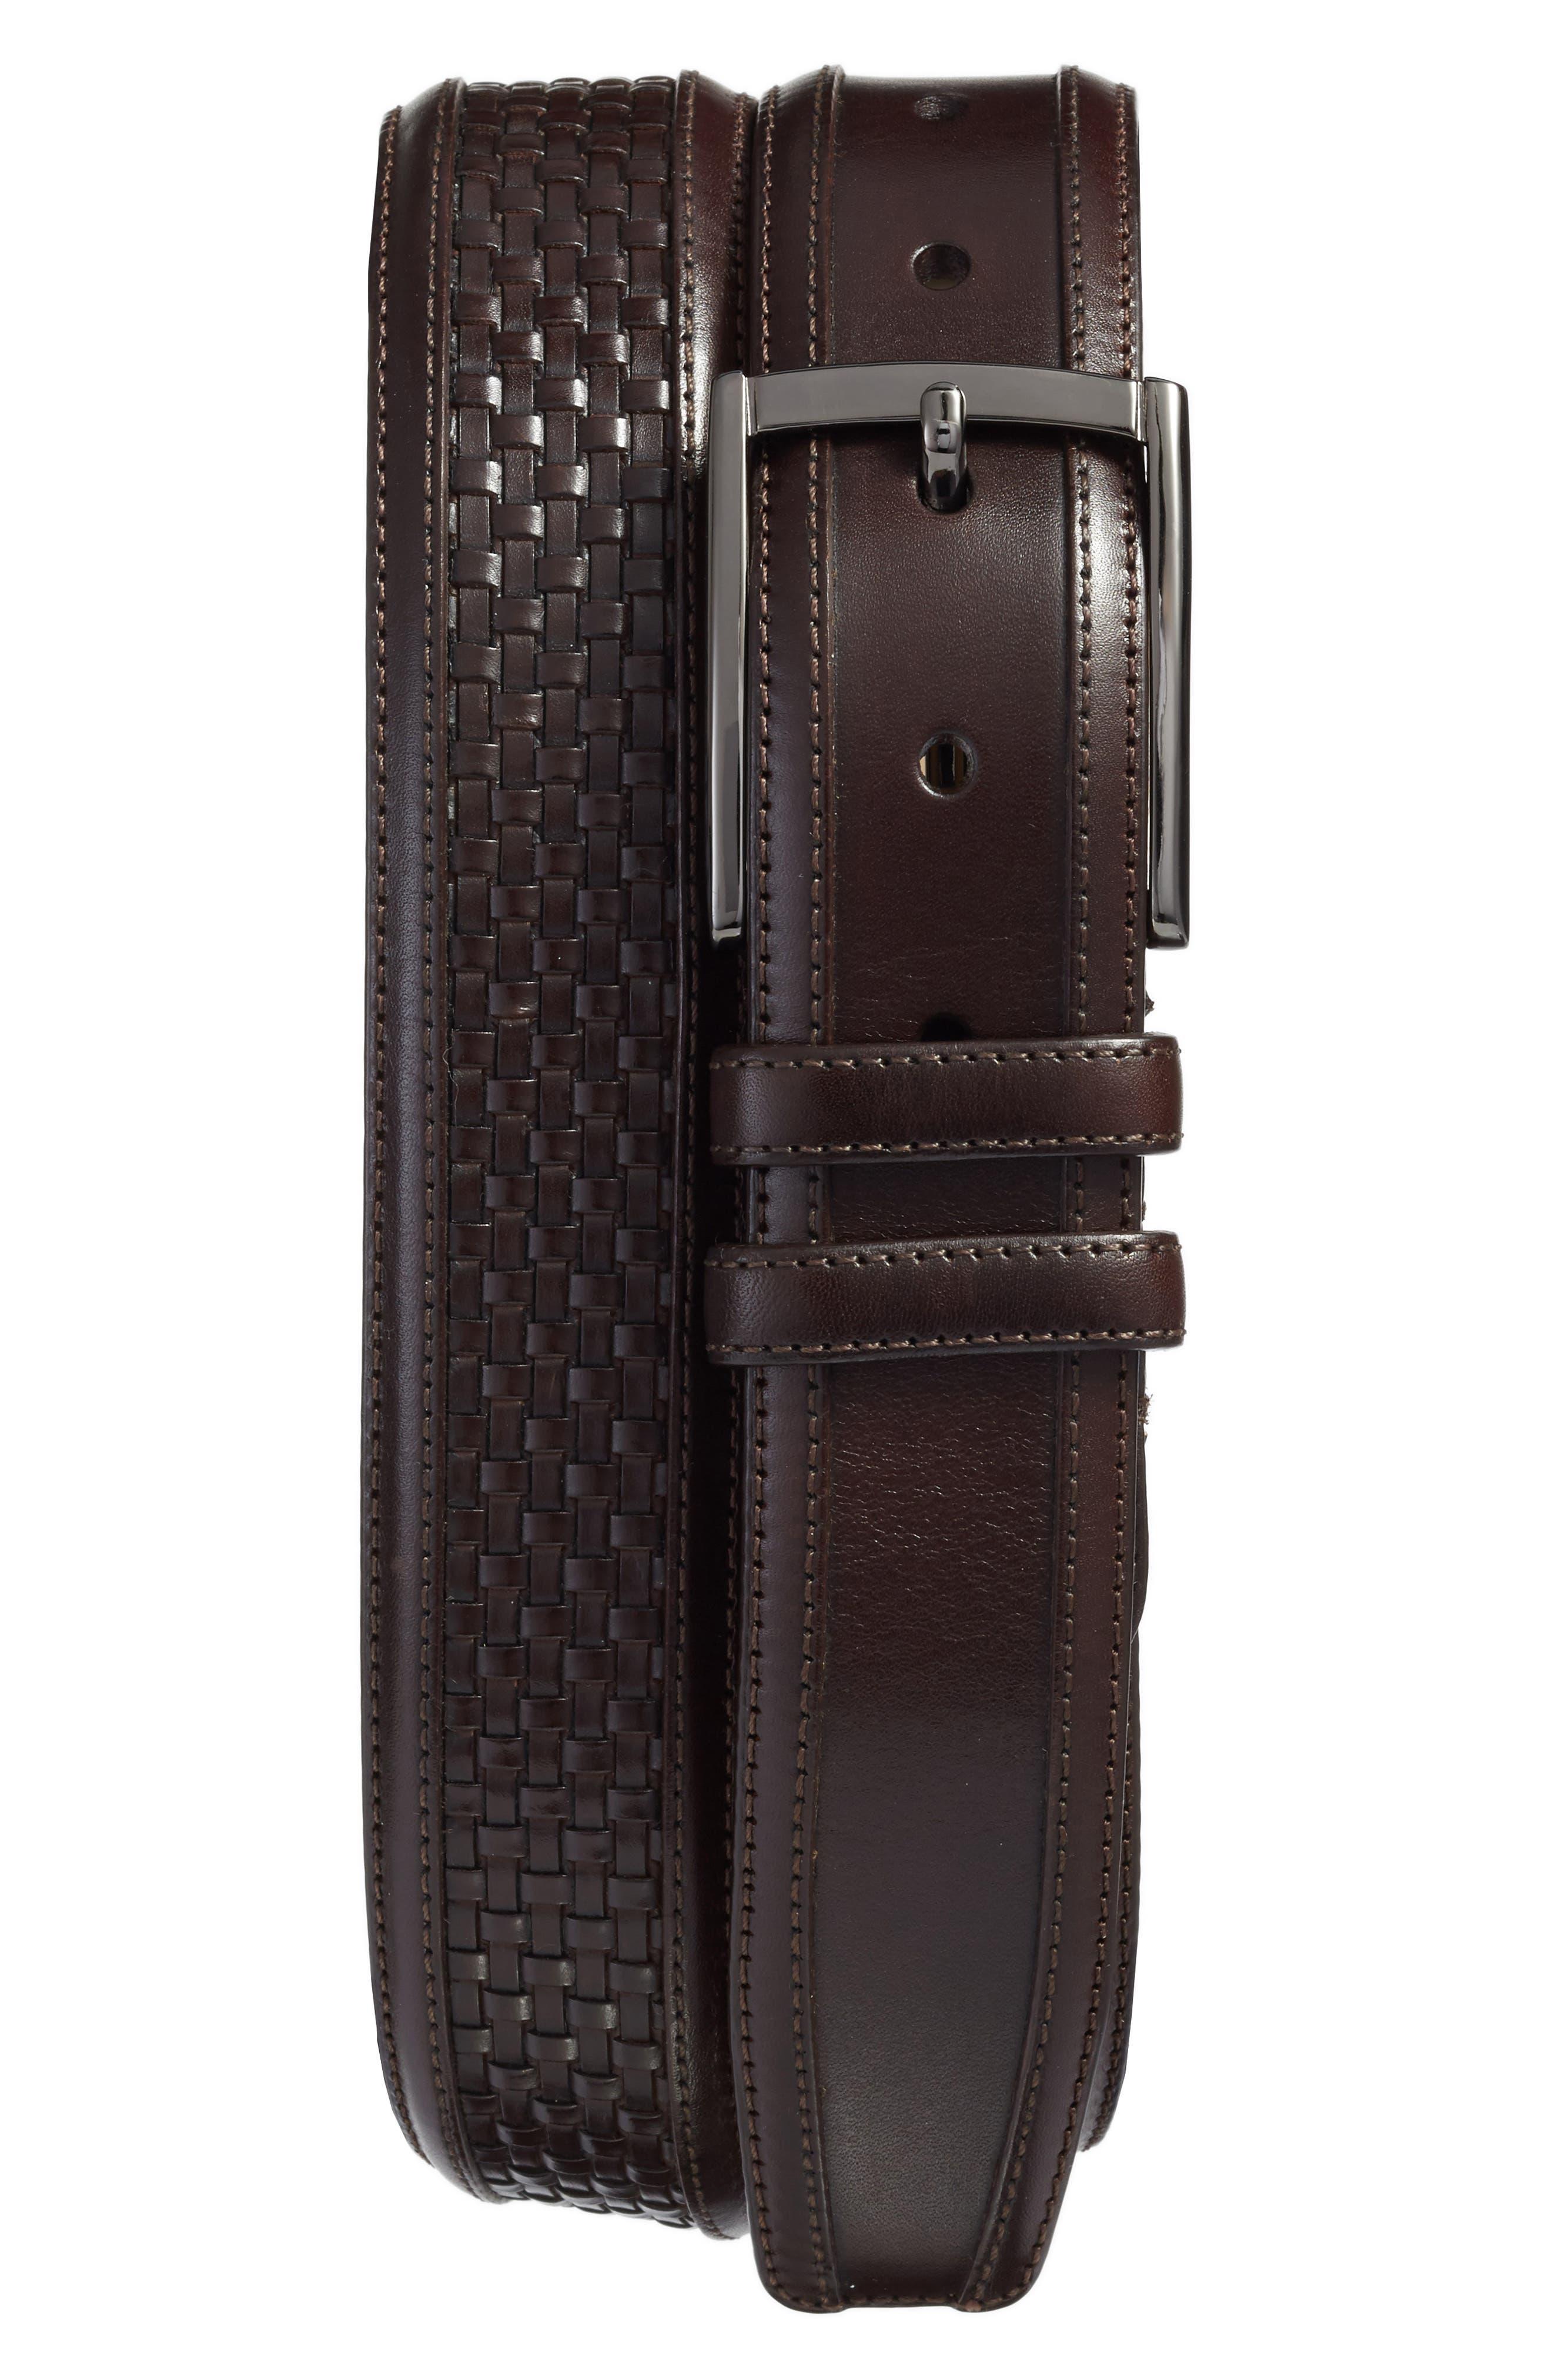 Parma Woven Leather Belt,                             Main thumbnail 1, color,                             Brown